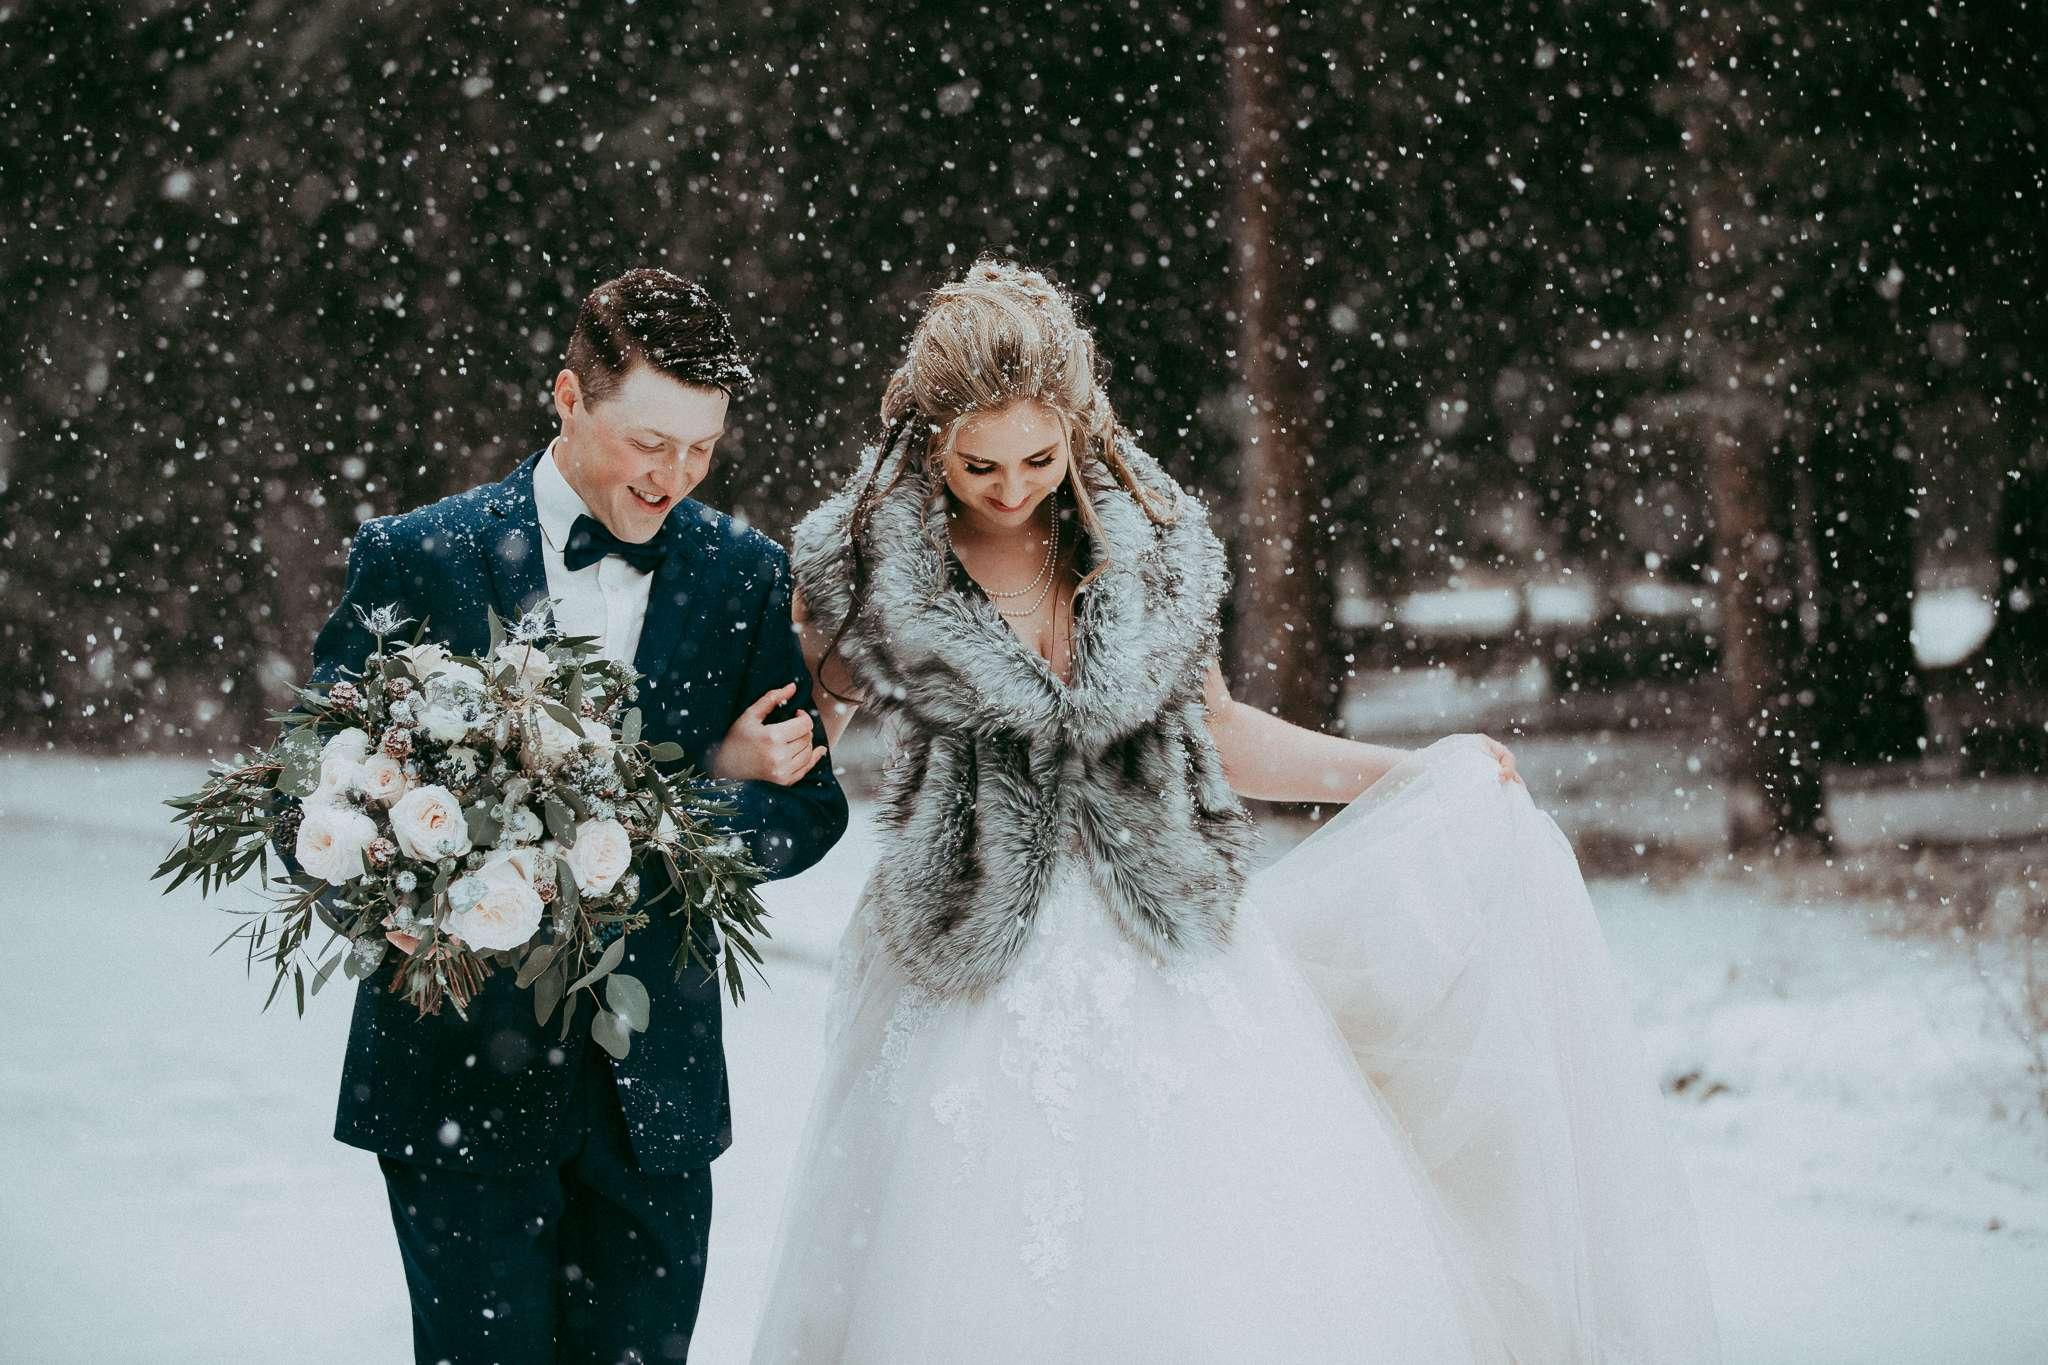 winter wedding, wedding fur, winter wedding style